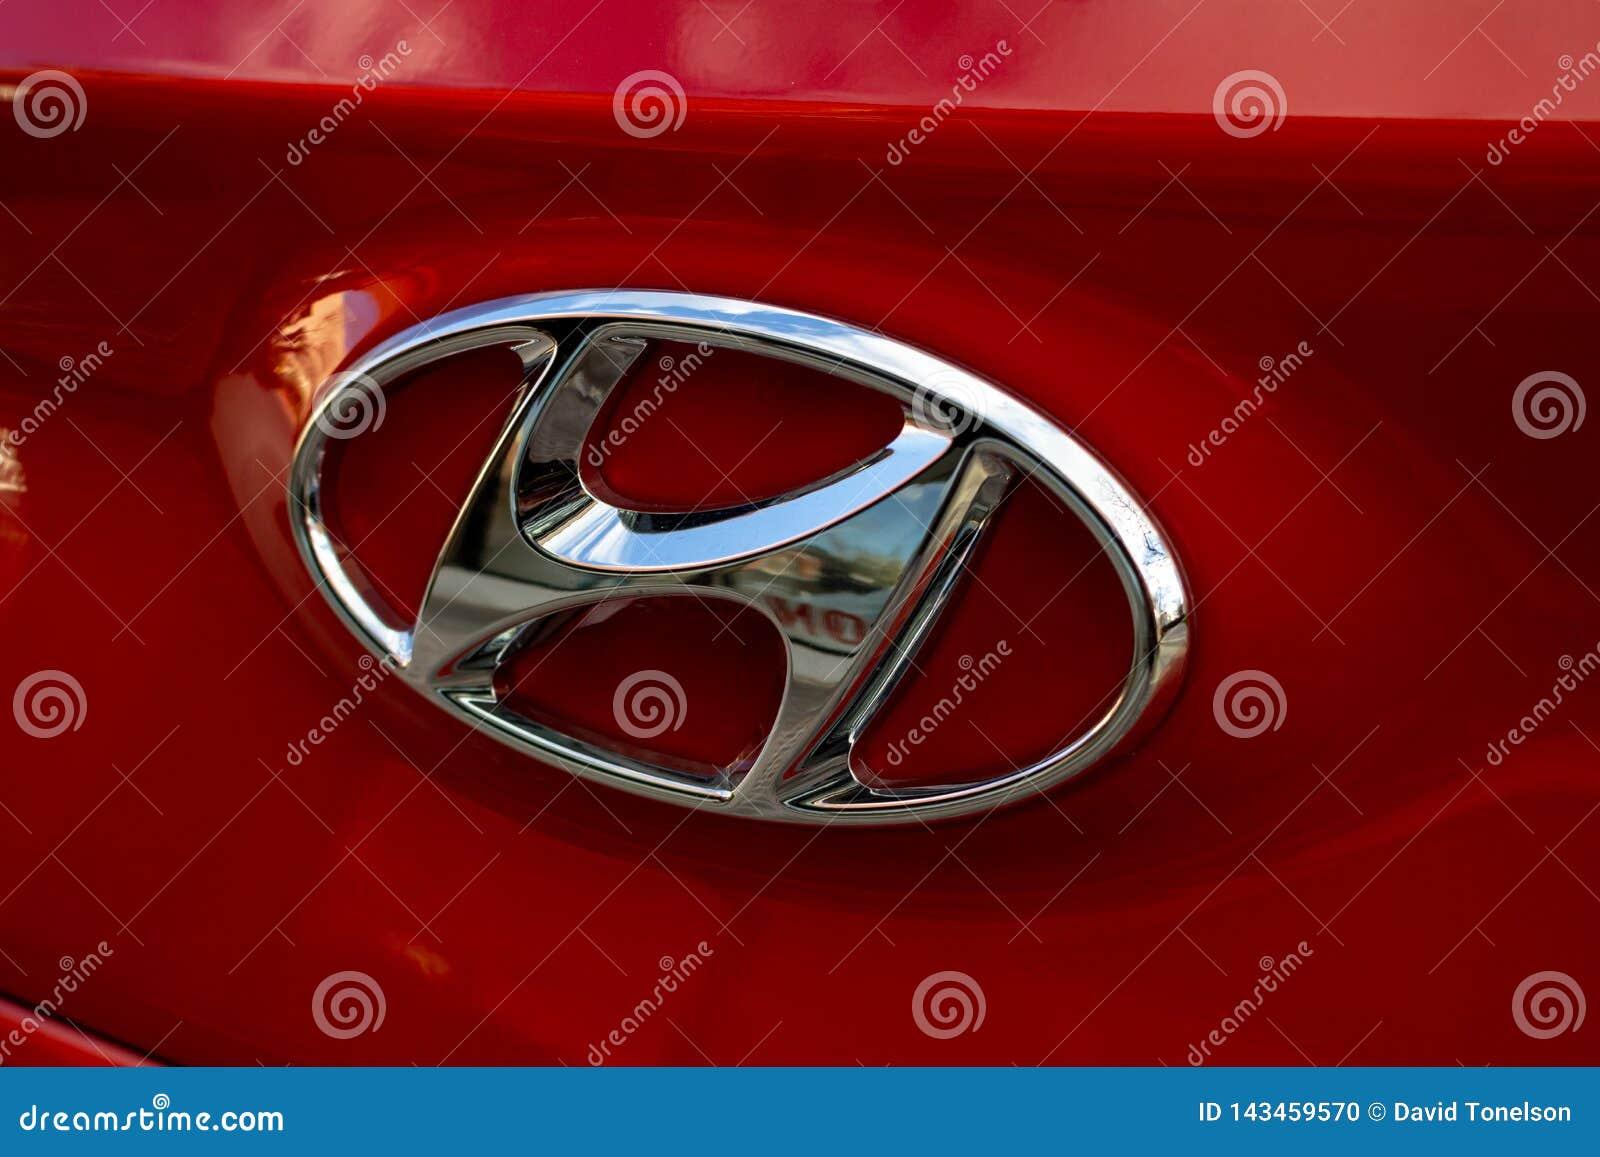 Hyundai-grillornament